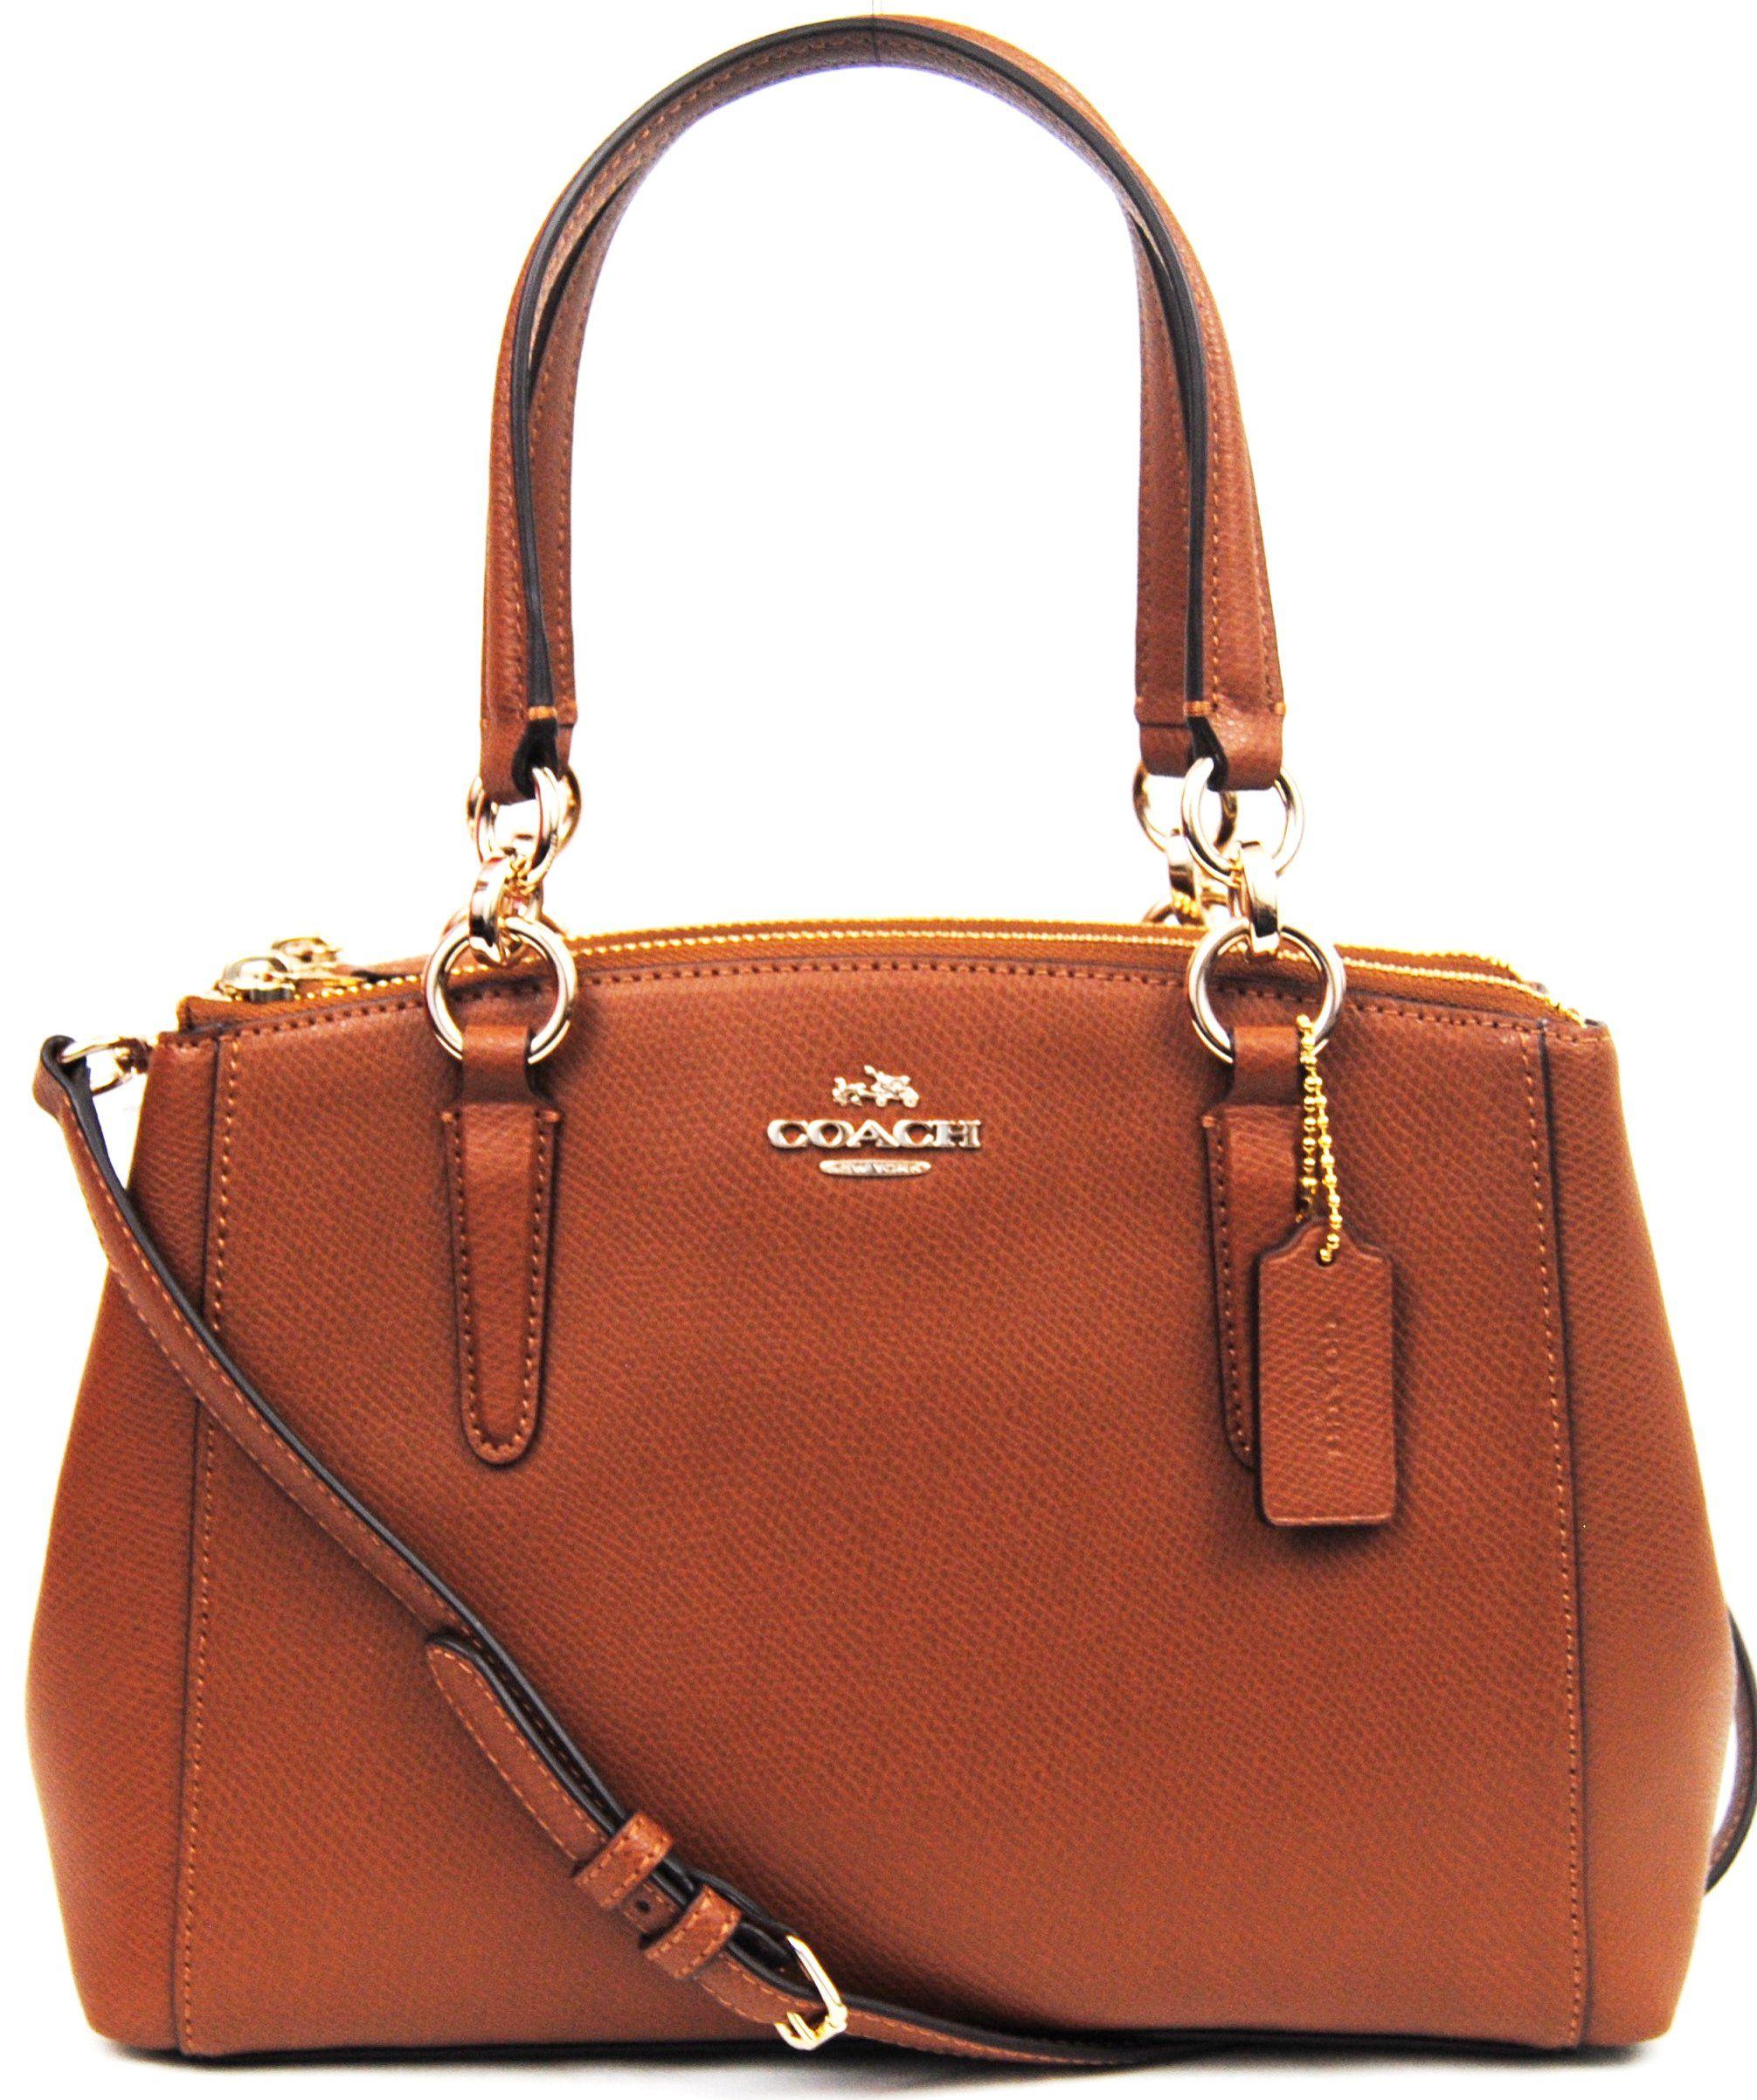 Coach Signature Mini Christie Carryall Bag Crossbody Saddle